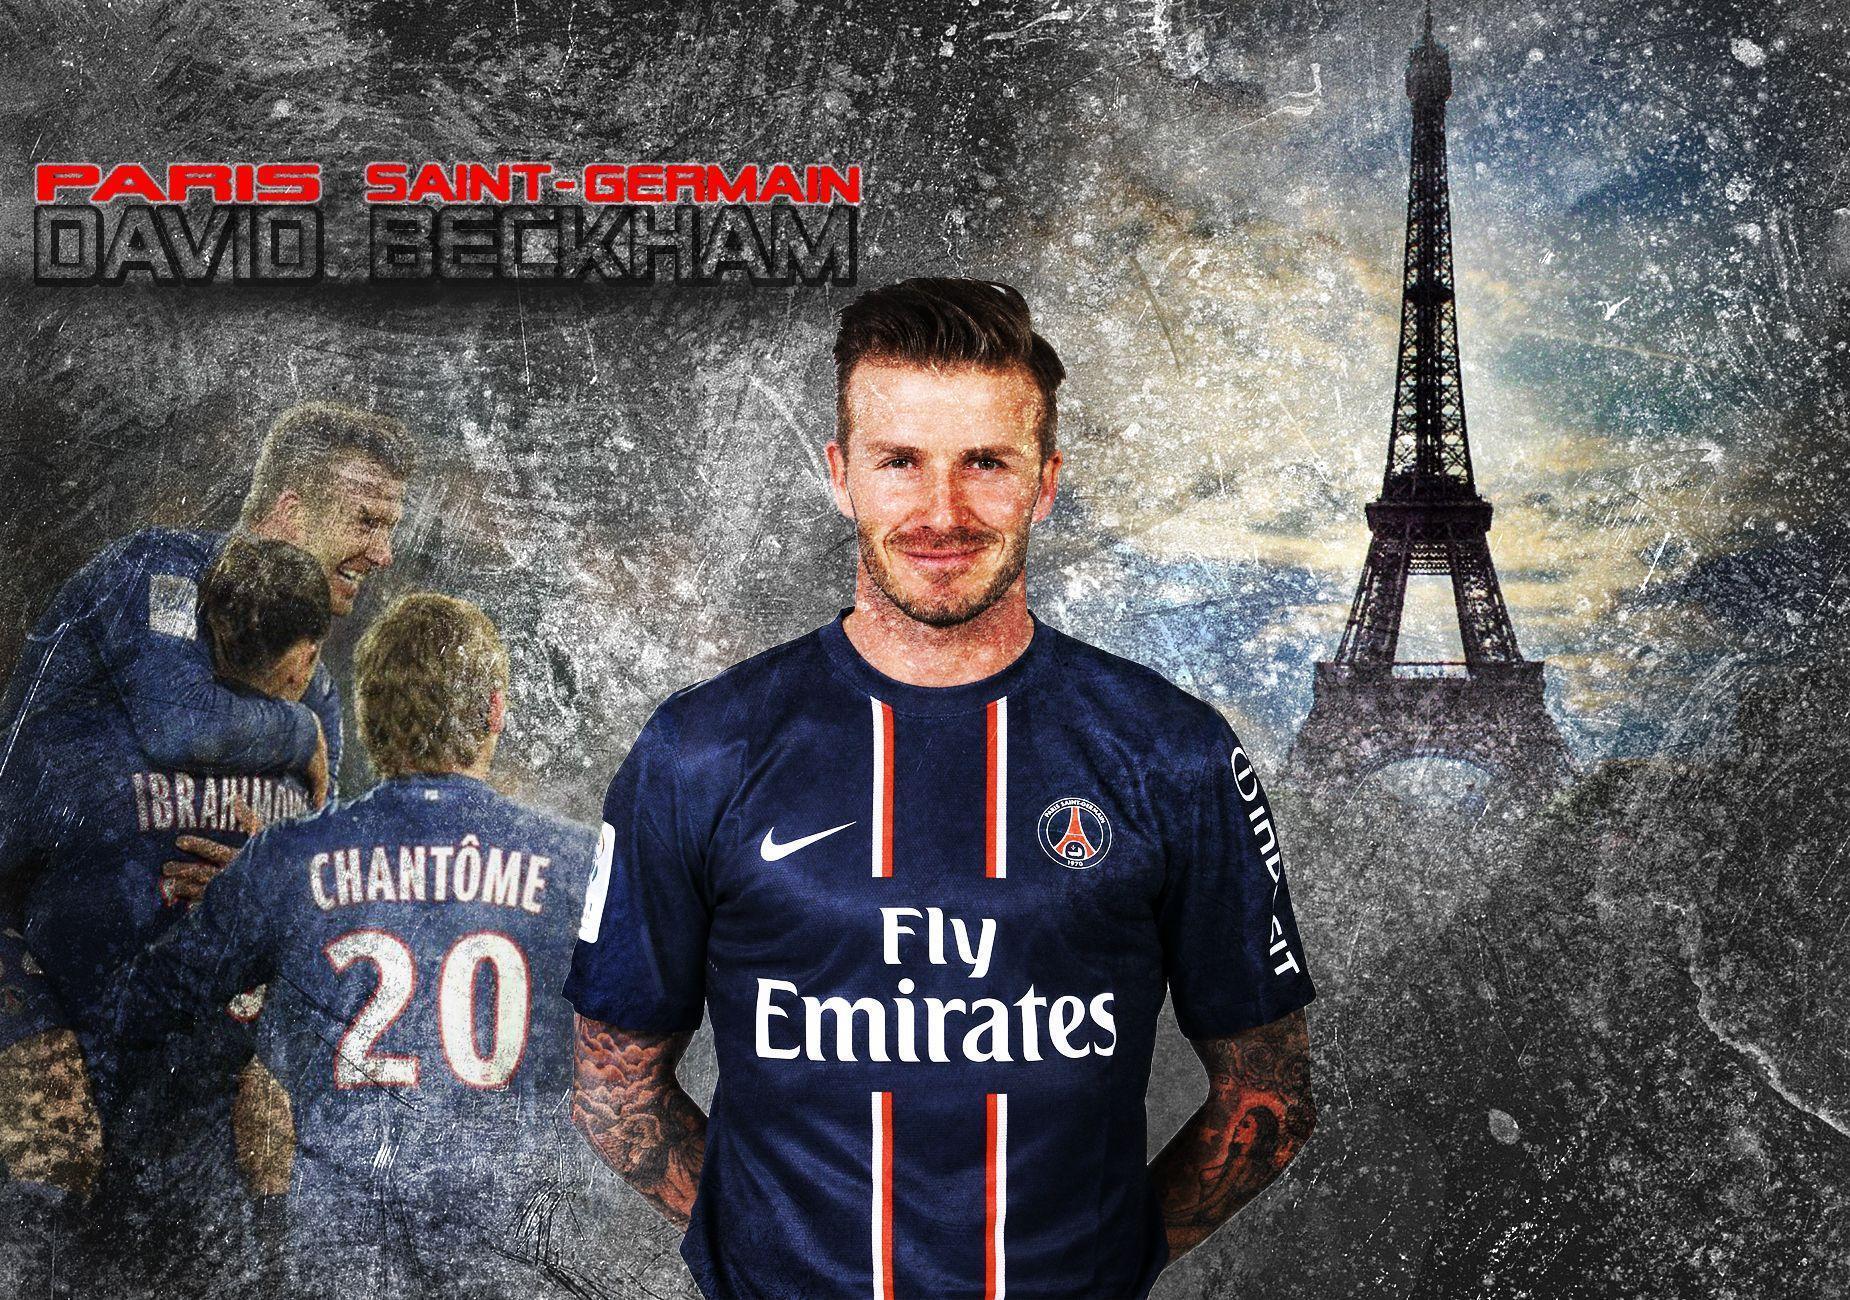 Paris Saint Germain Wallpapers Wallpaper Cave Rh Wallpapercave Com David Beckham Milan England Jersey